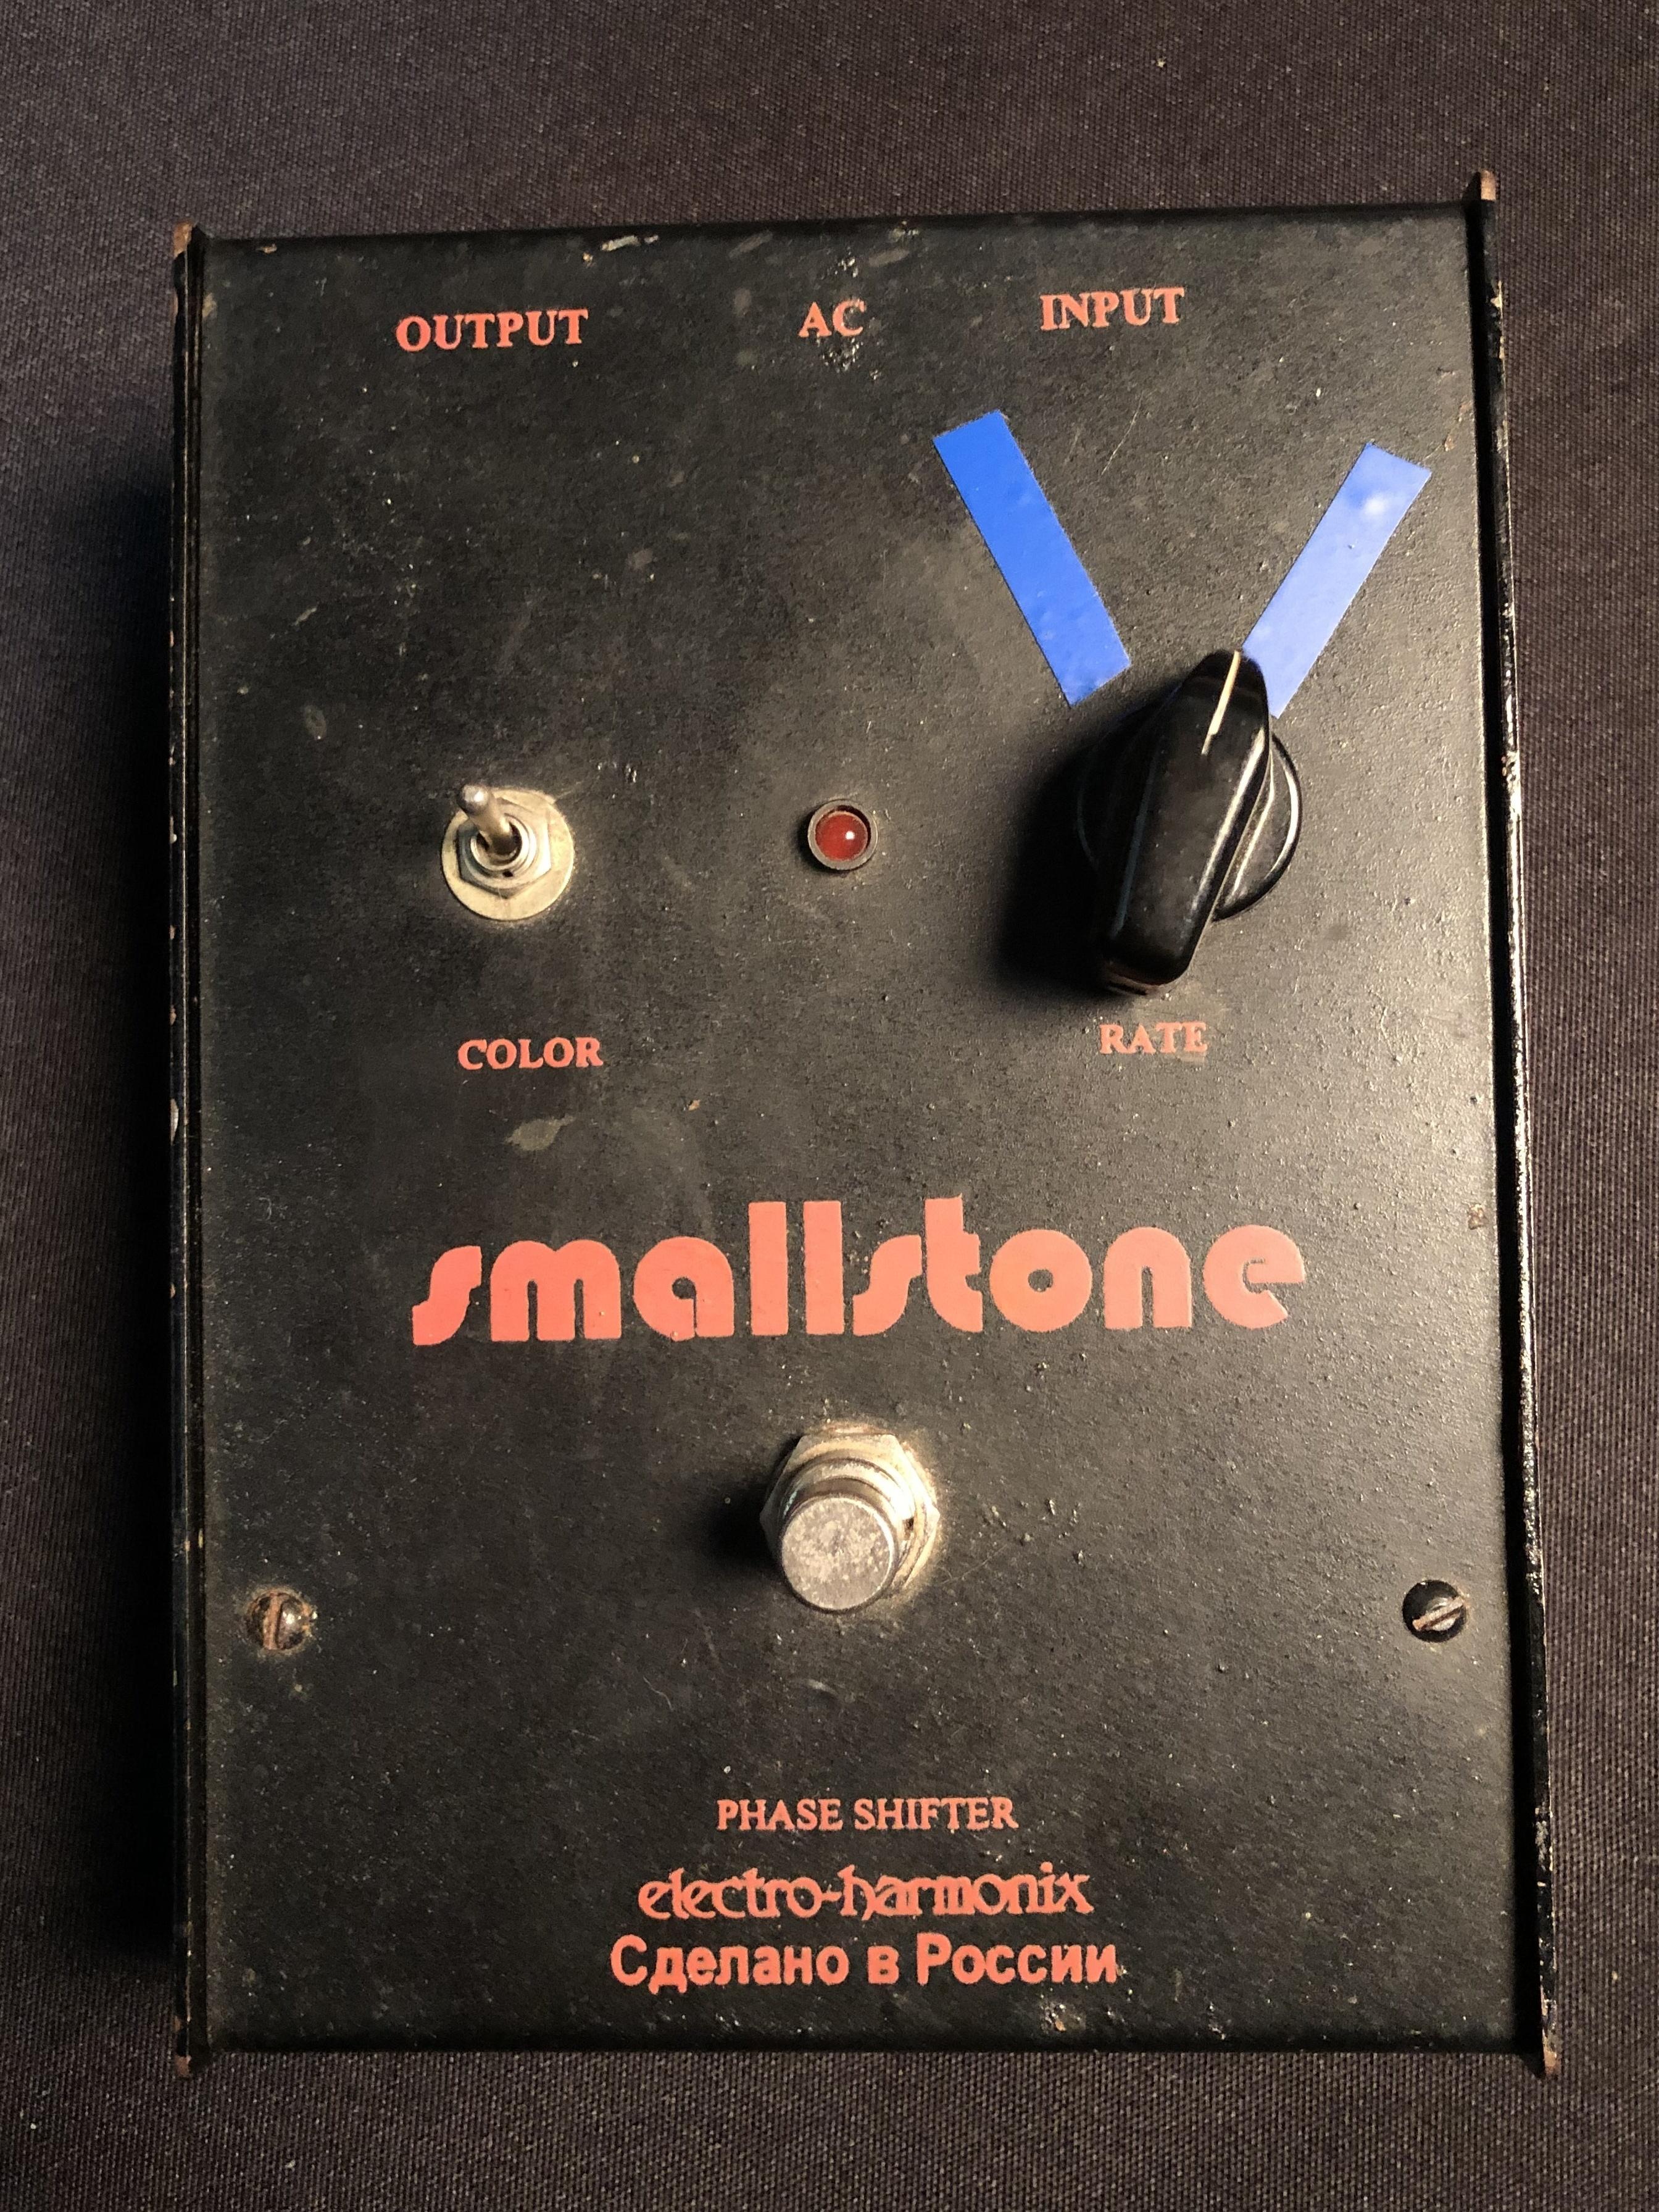 ELECTRO-HARMONIX - Small Stone Phase Shifter Pedal